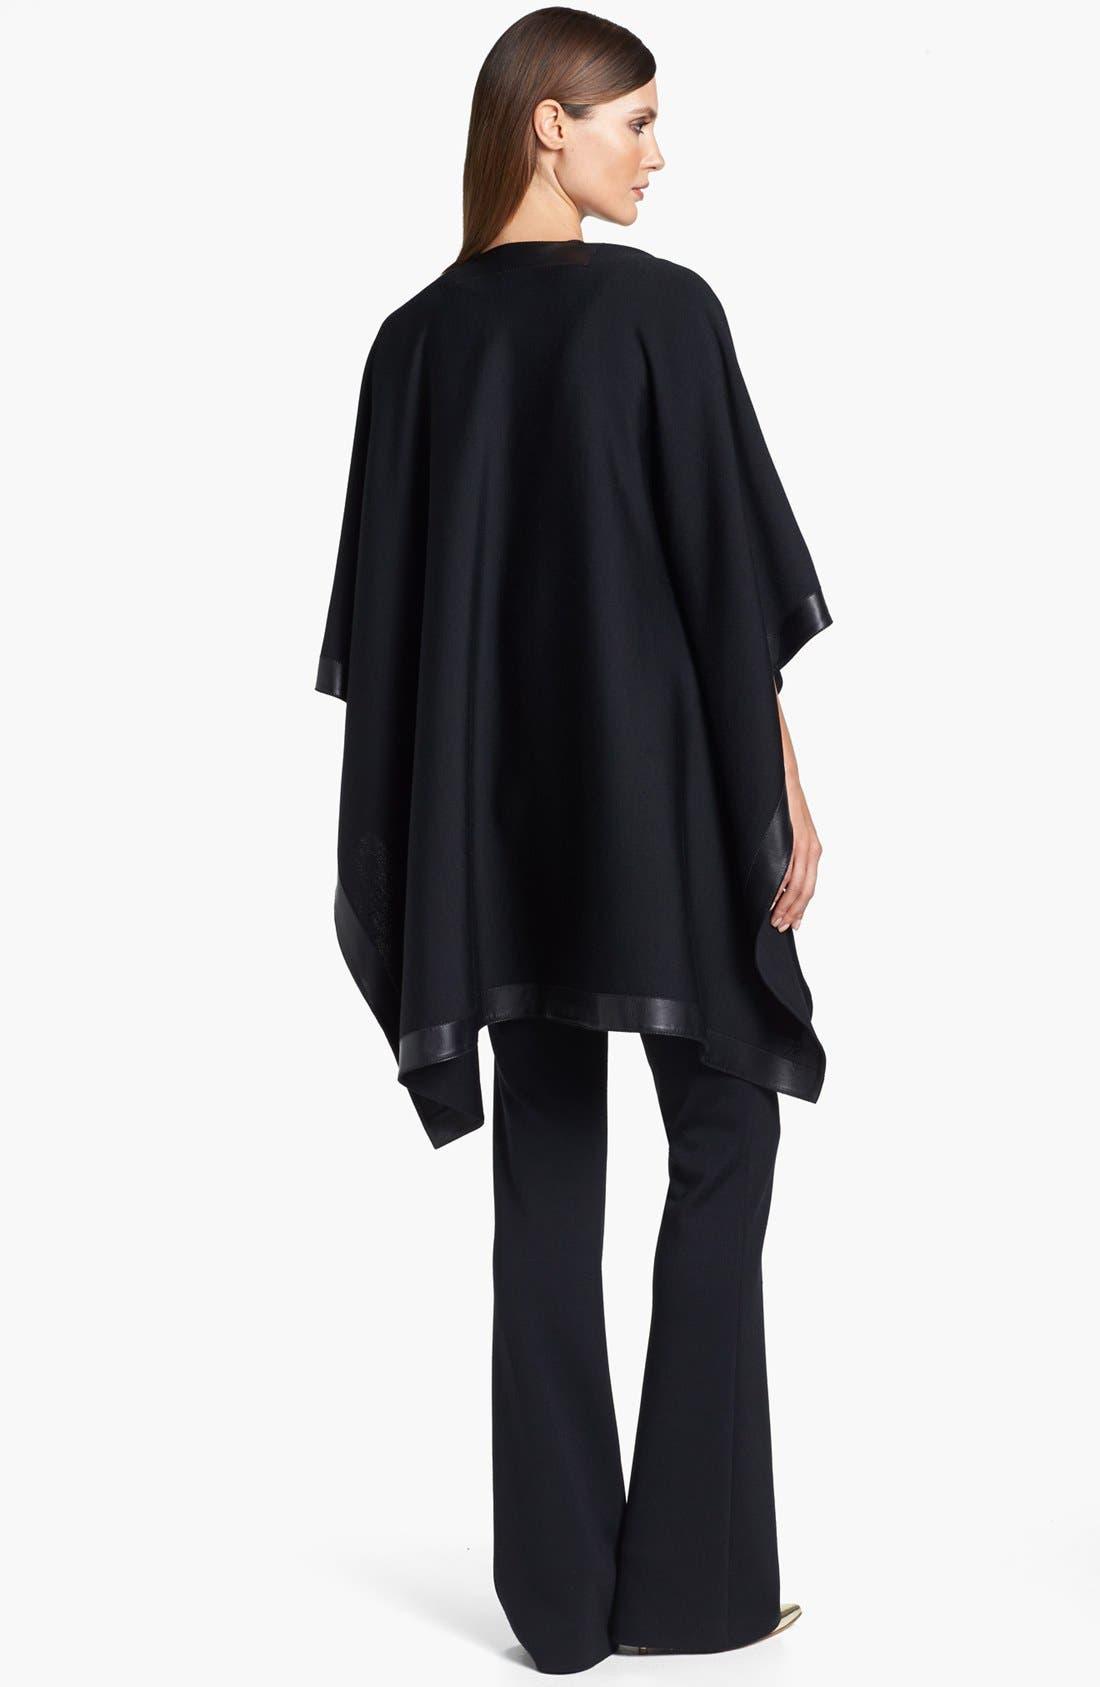 Alternate Image 3  - St. John Collection 'Kasia' Bootcut Milano Knit Pants